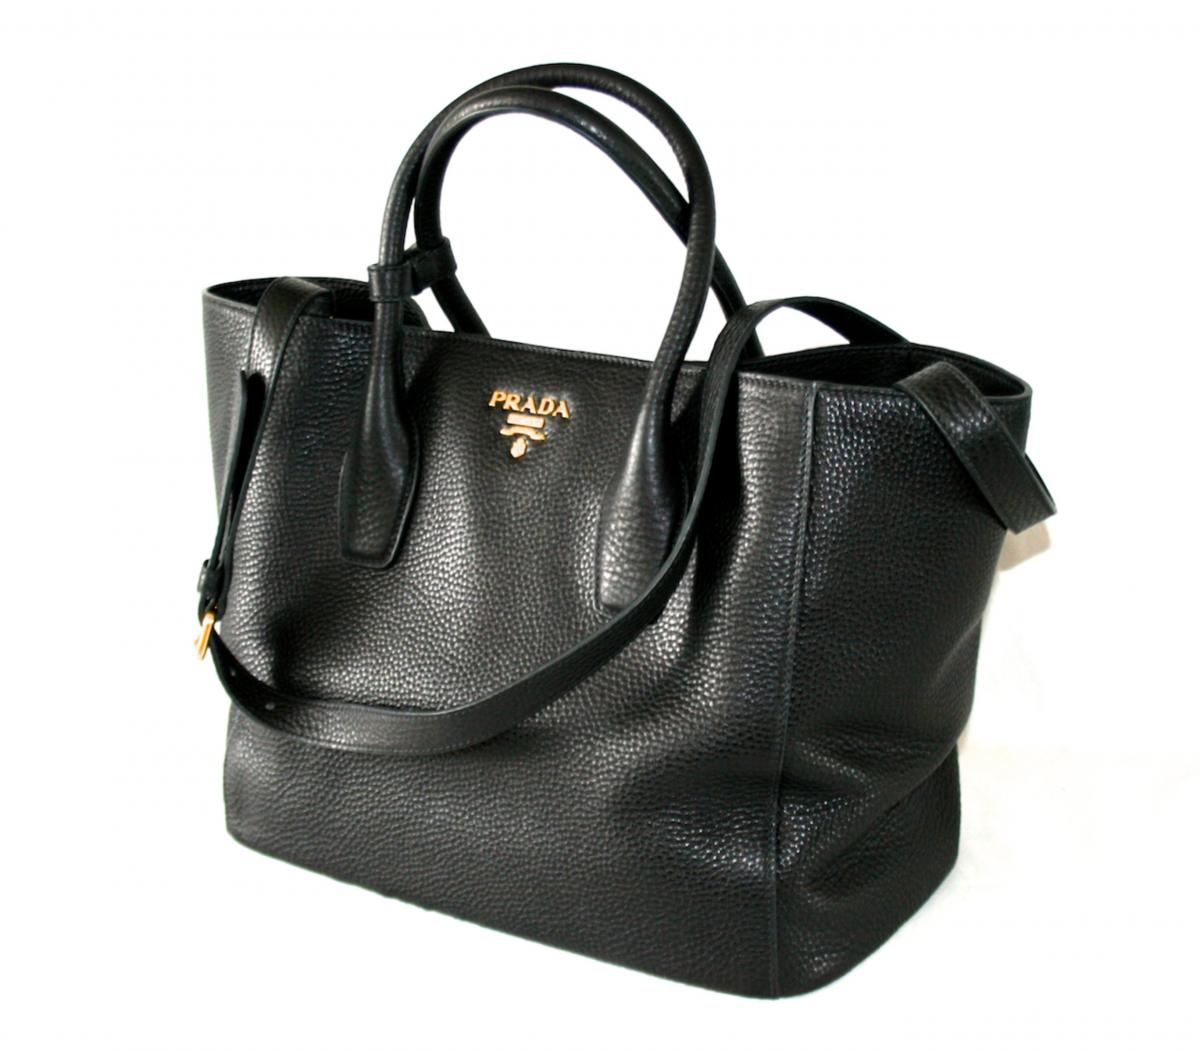 authentic luxury prada shoulder bag handbag 1bg694 black new ebay. Black Bedroom Furniture Sets. Home Design Ideas